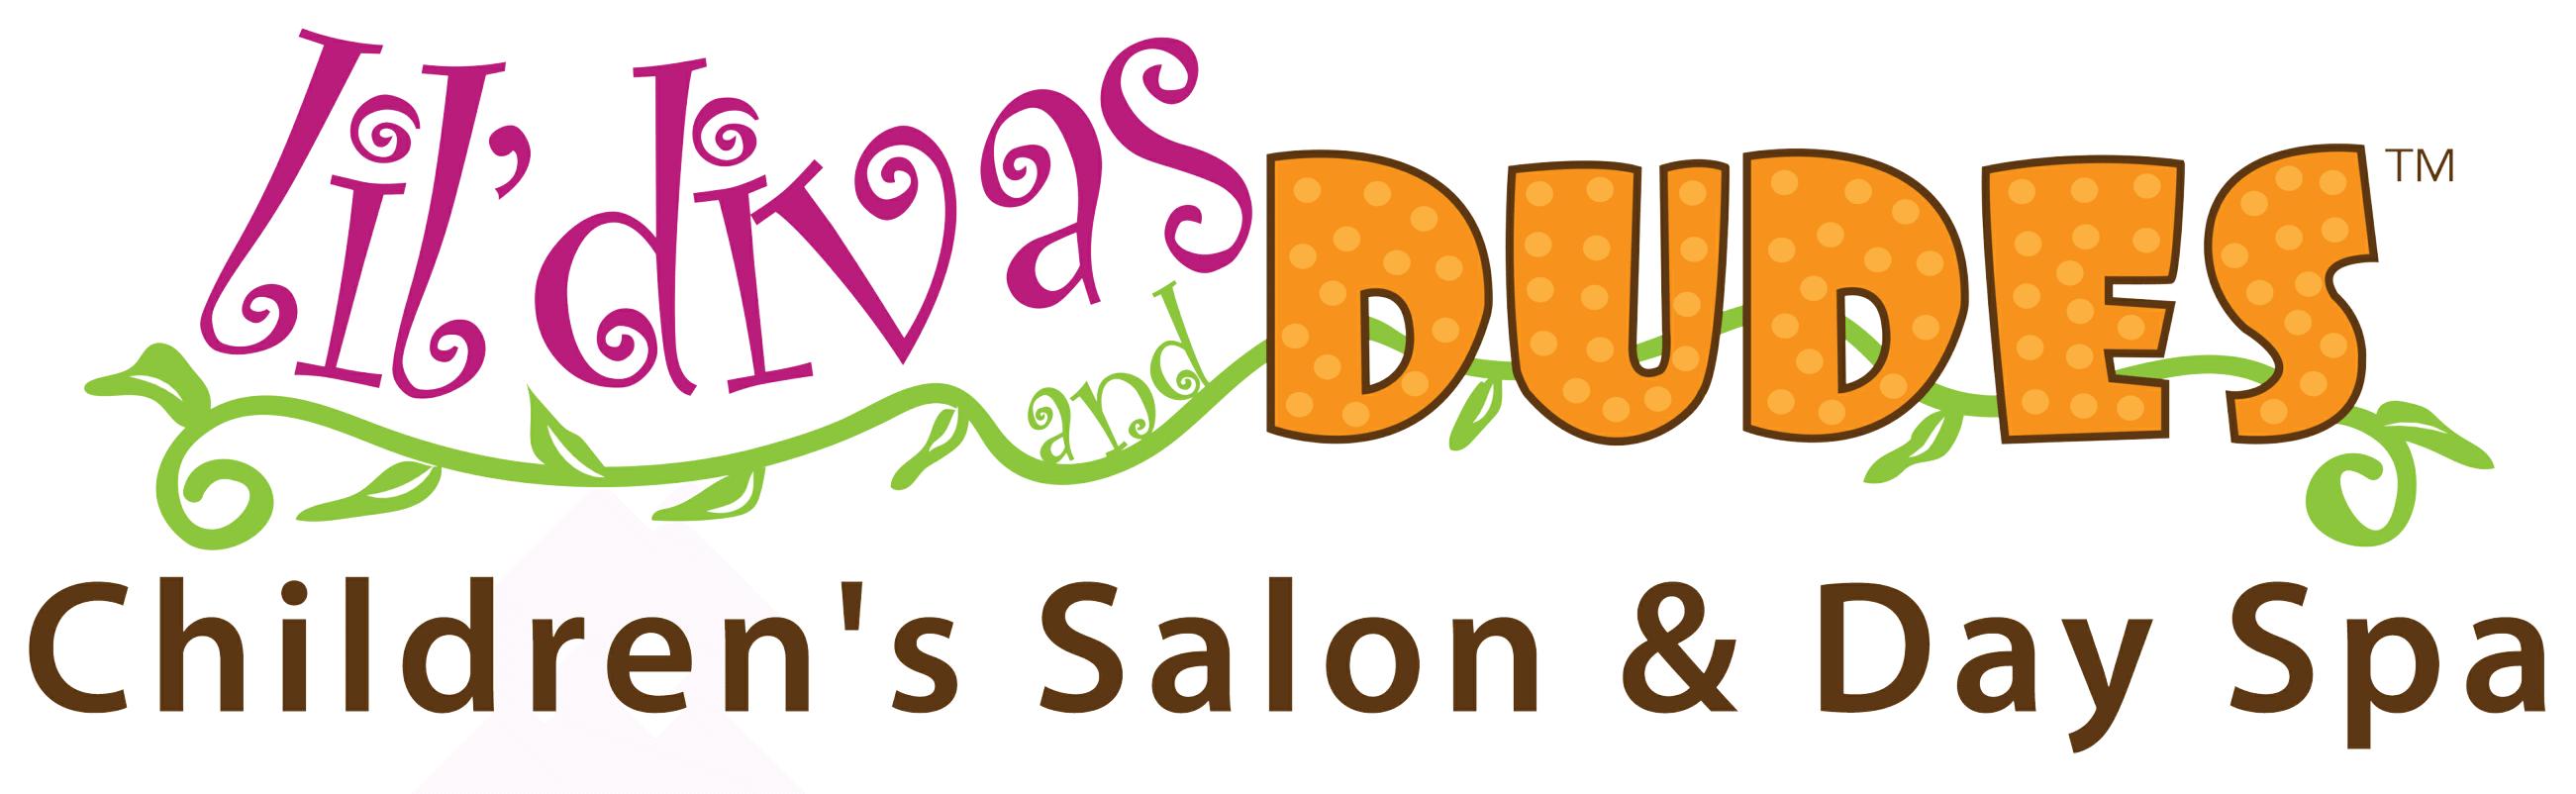 LDD-Spa-Logo-2015-1